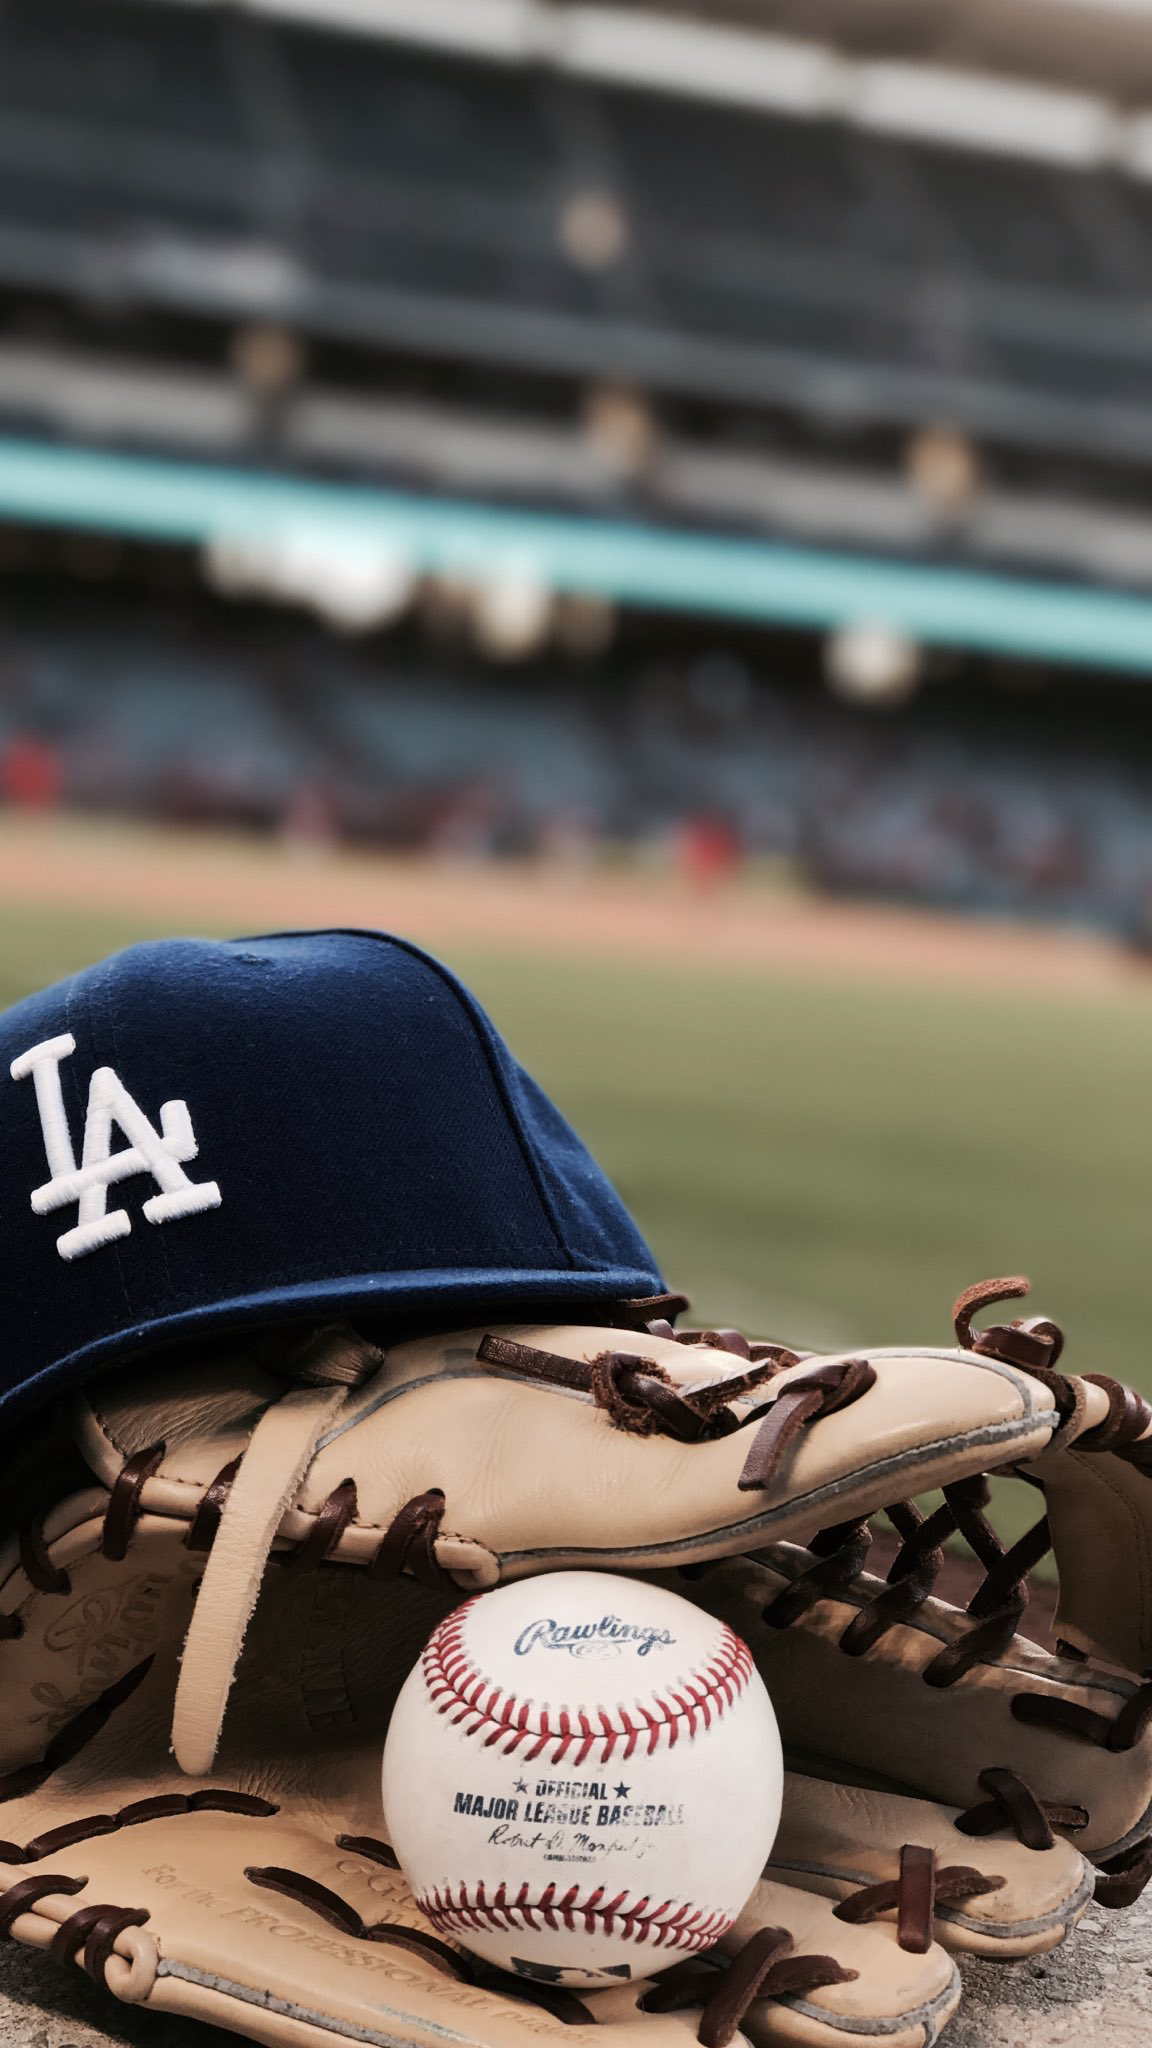 Go Dodgers Dodgers baseball, Baseball wallpaper, Dodgers